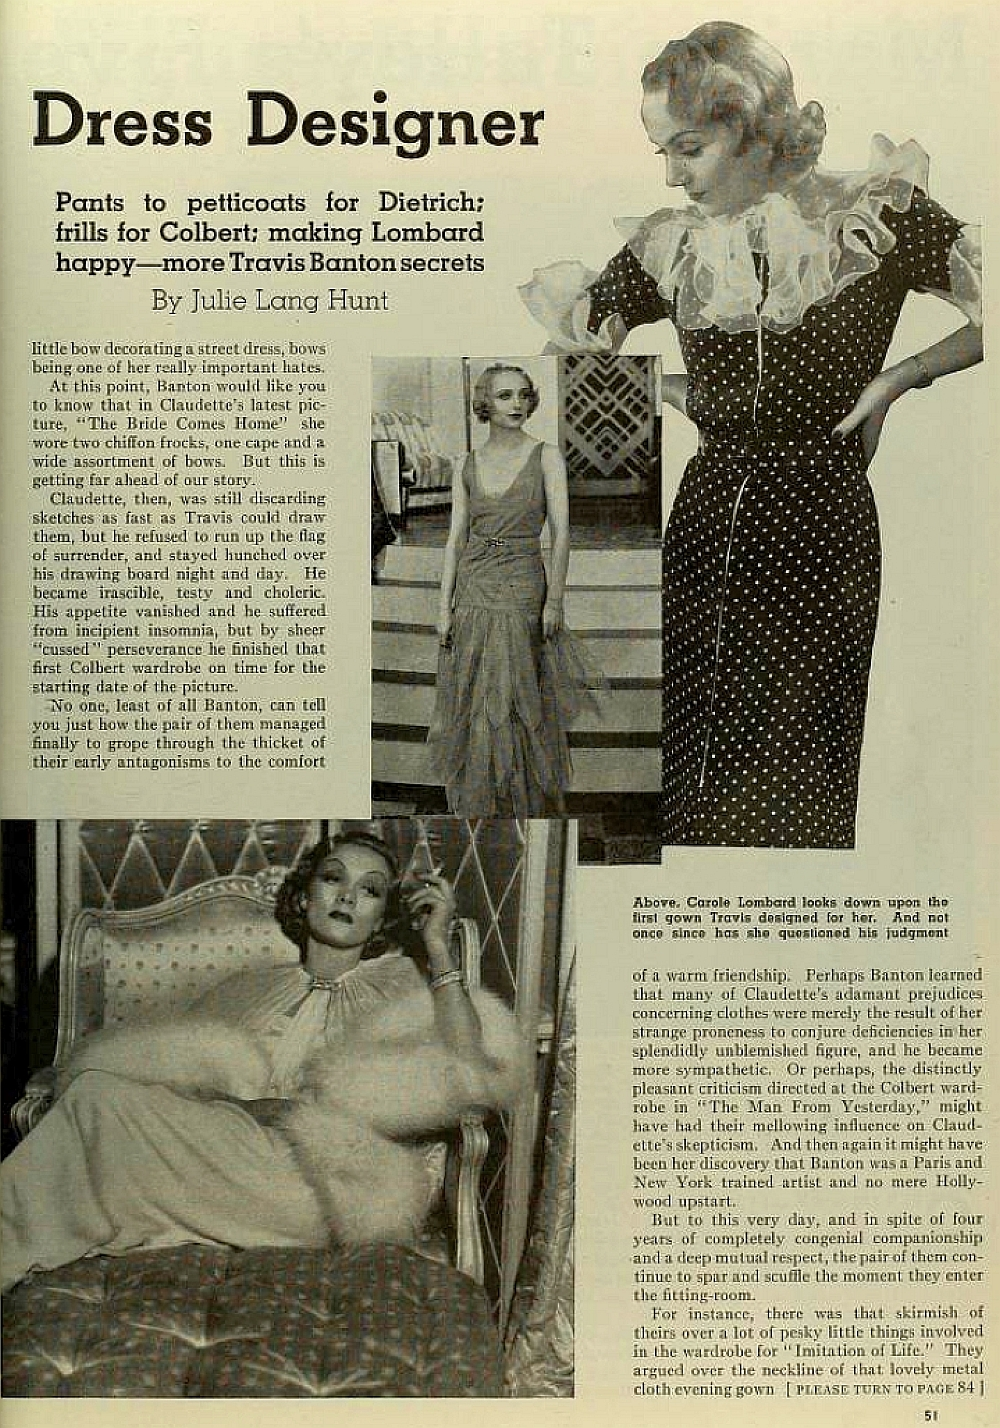 carole lombard photoplay june 1936 travis banton 01 larger